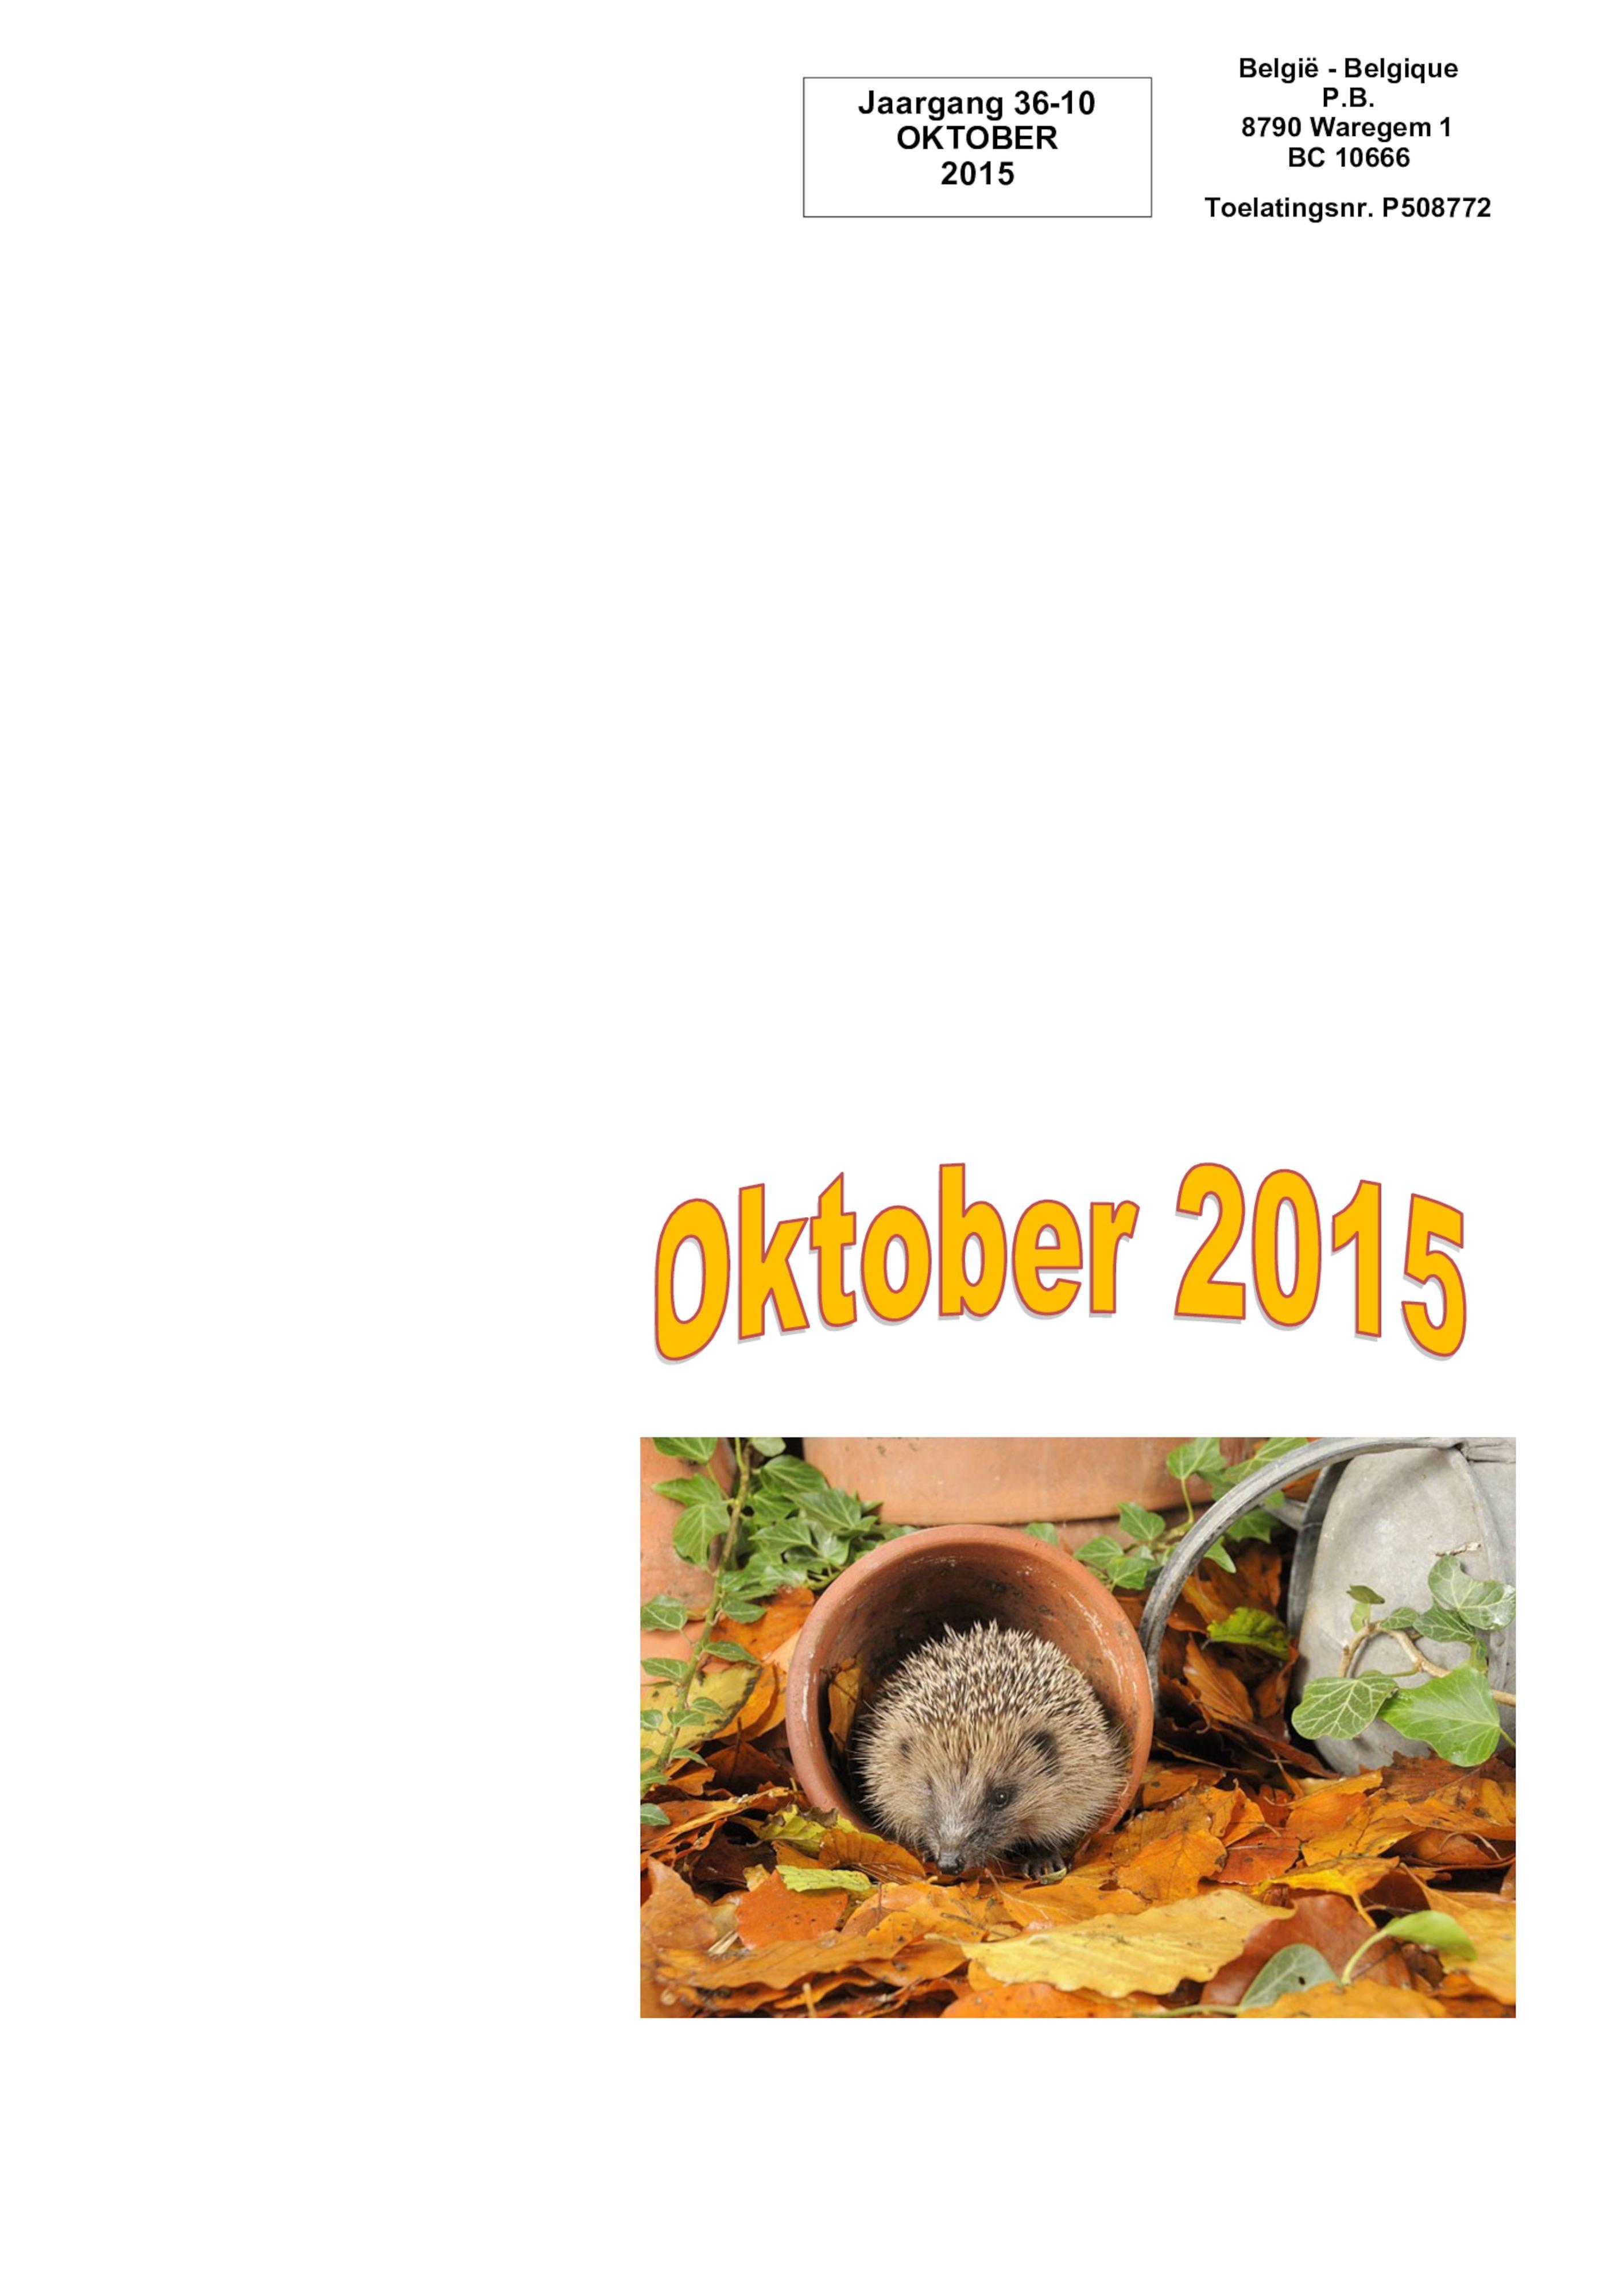 De Belle oktober 2015.pdf